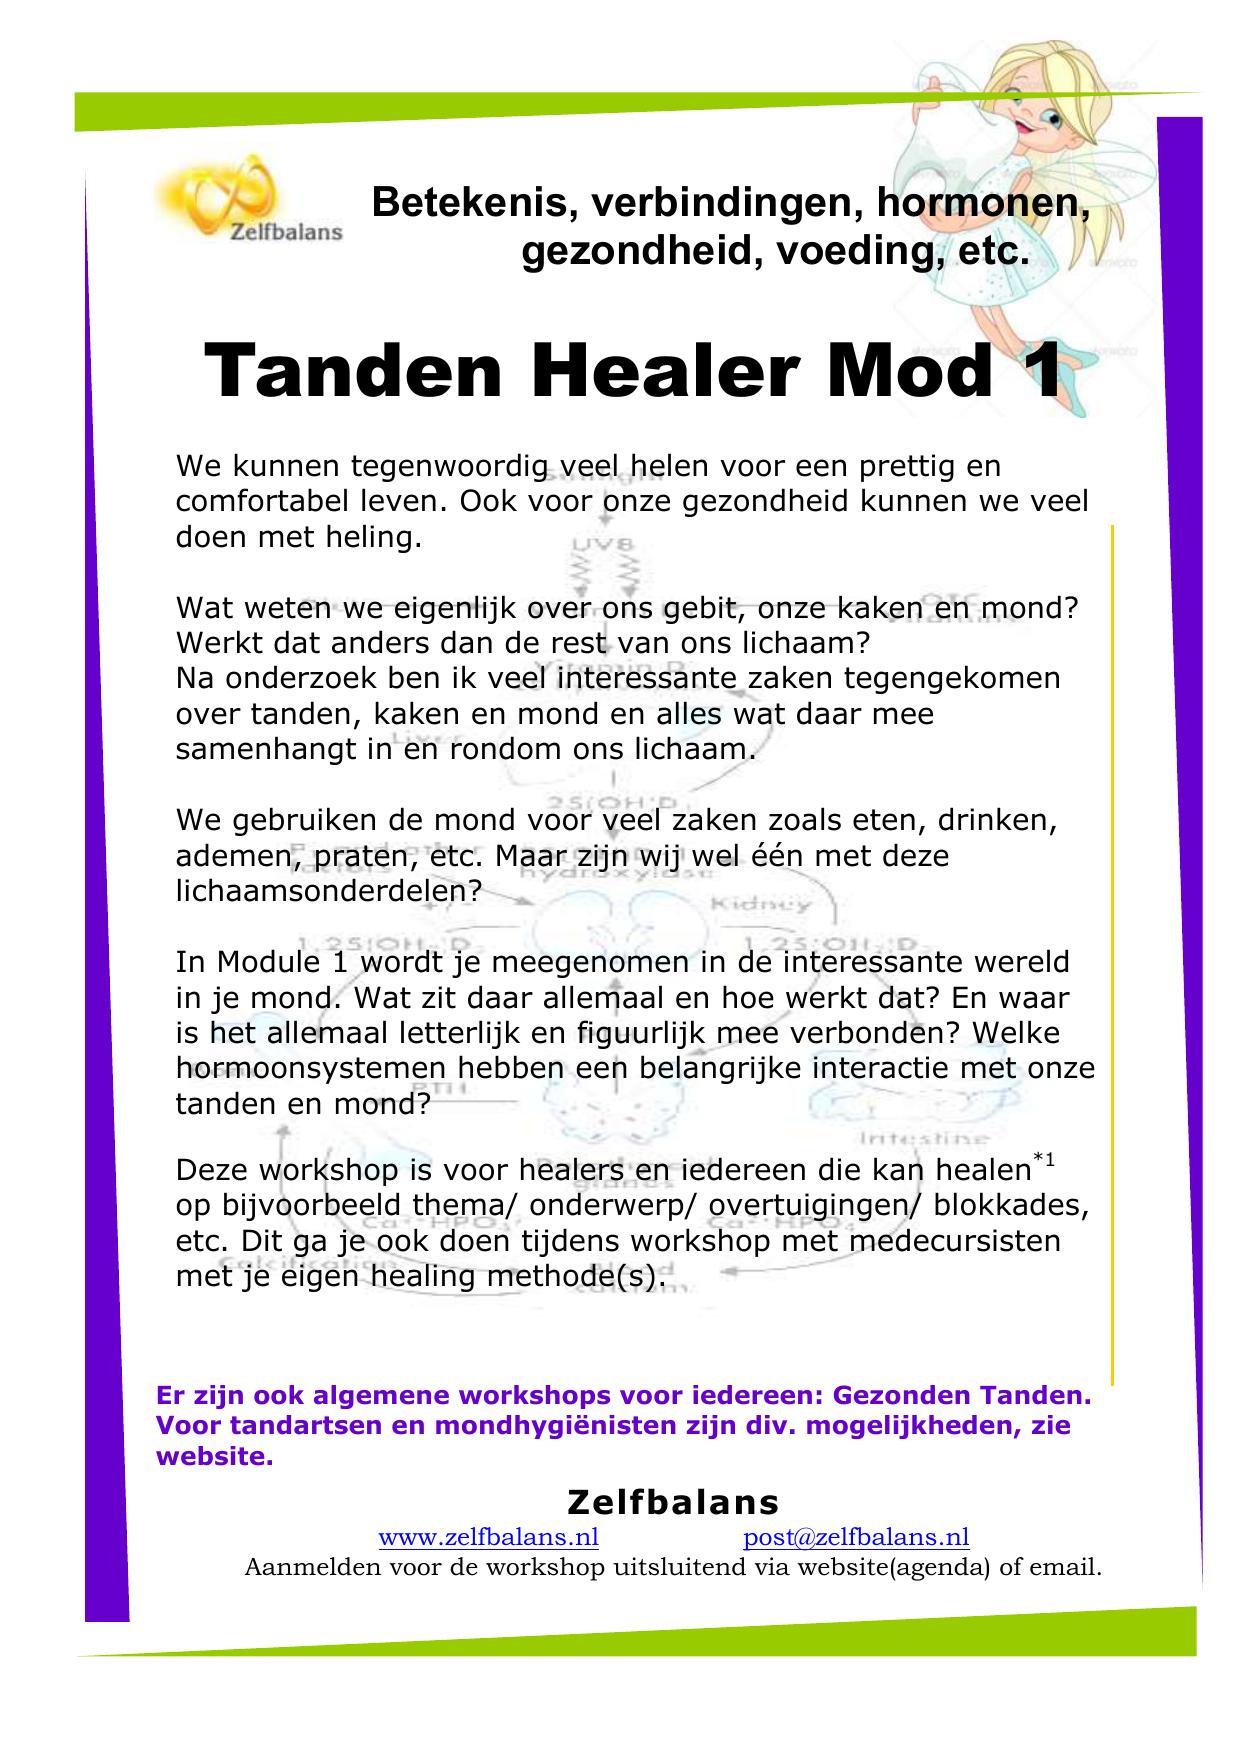 Tanden Healer Mod 1